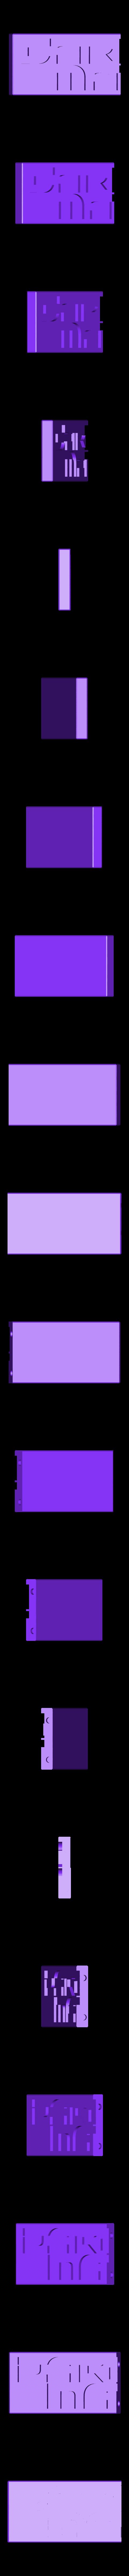 DM_Background_L_01.stl Download free STL file Dark Matter - Main Title Logo • 3D printer object, SYFY